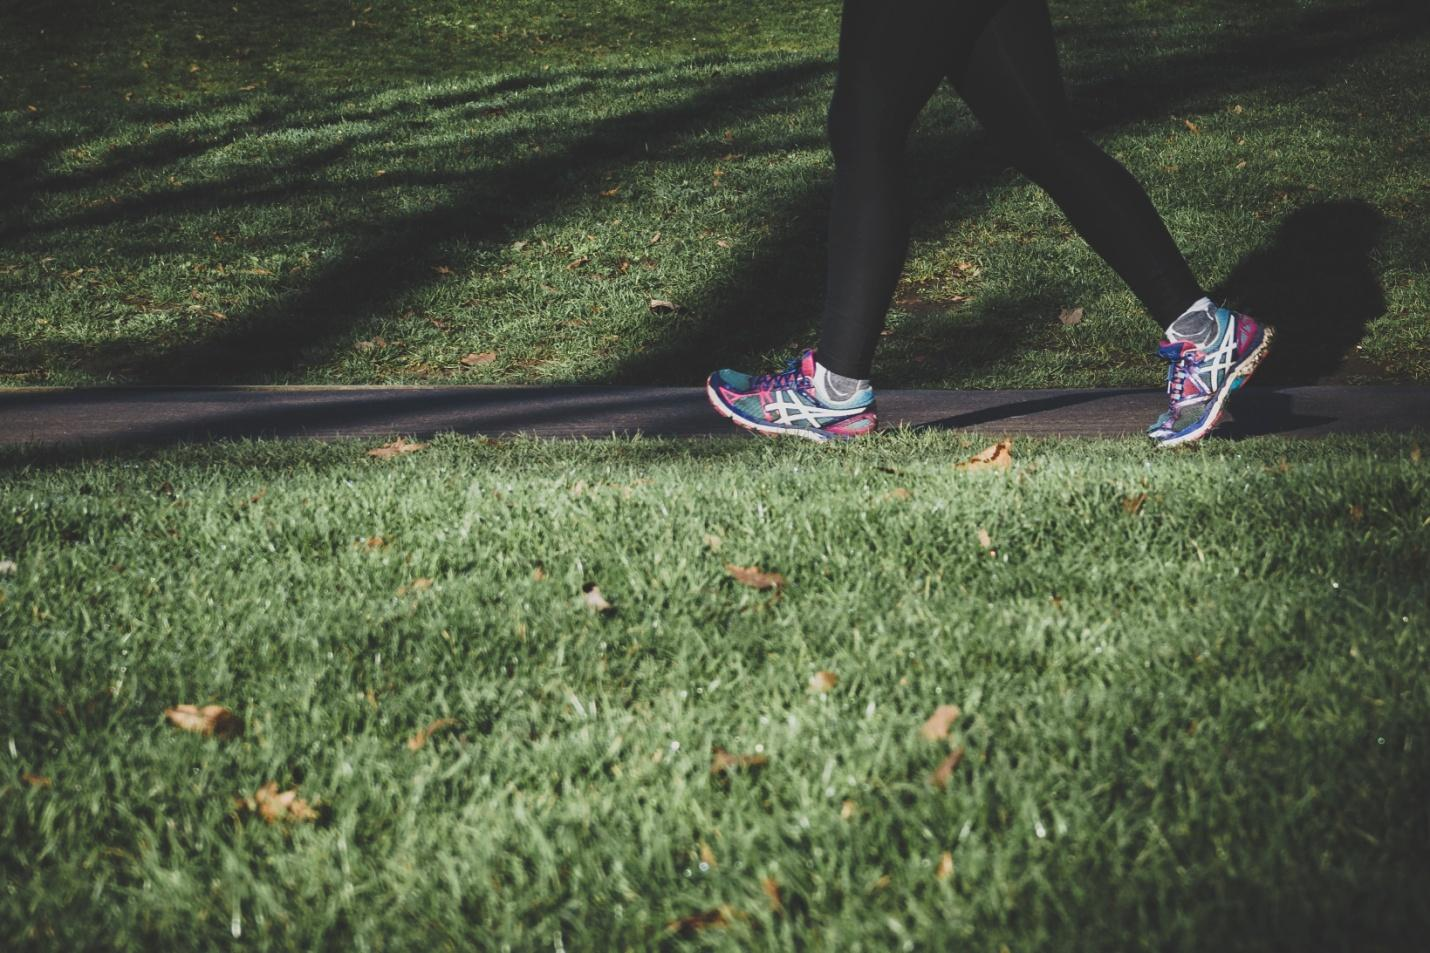 Prevent Excessive Jogging